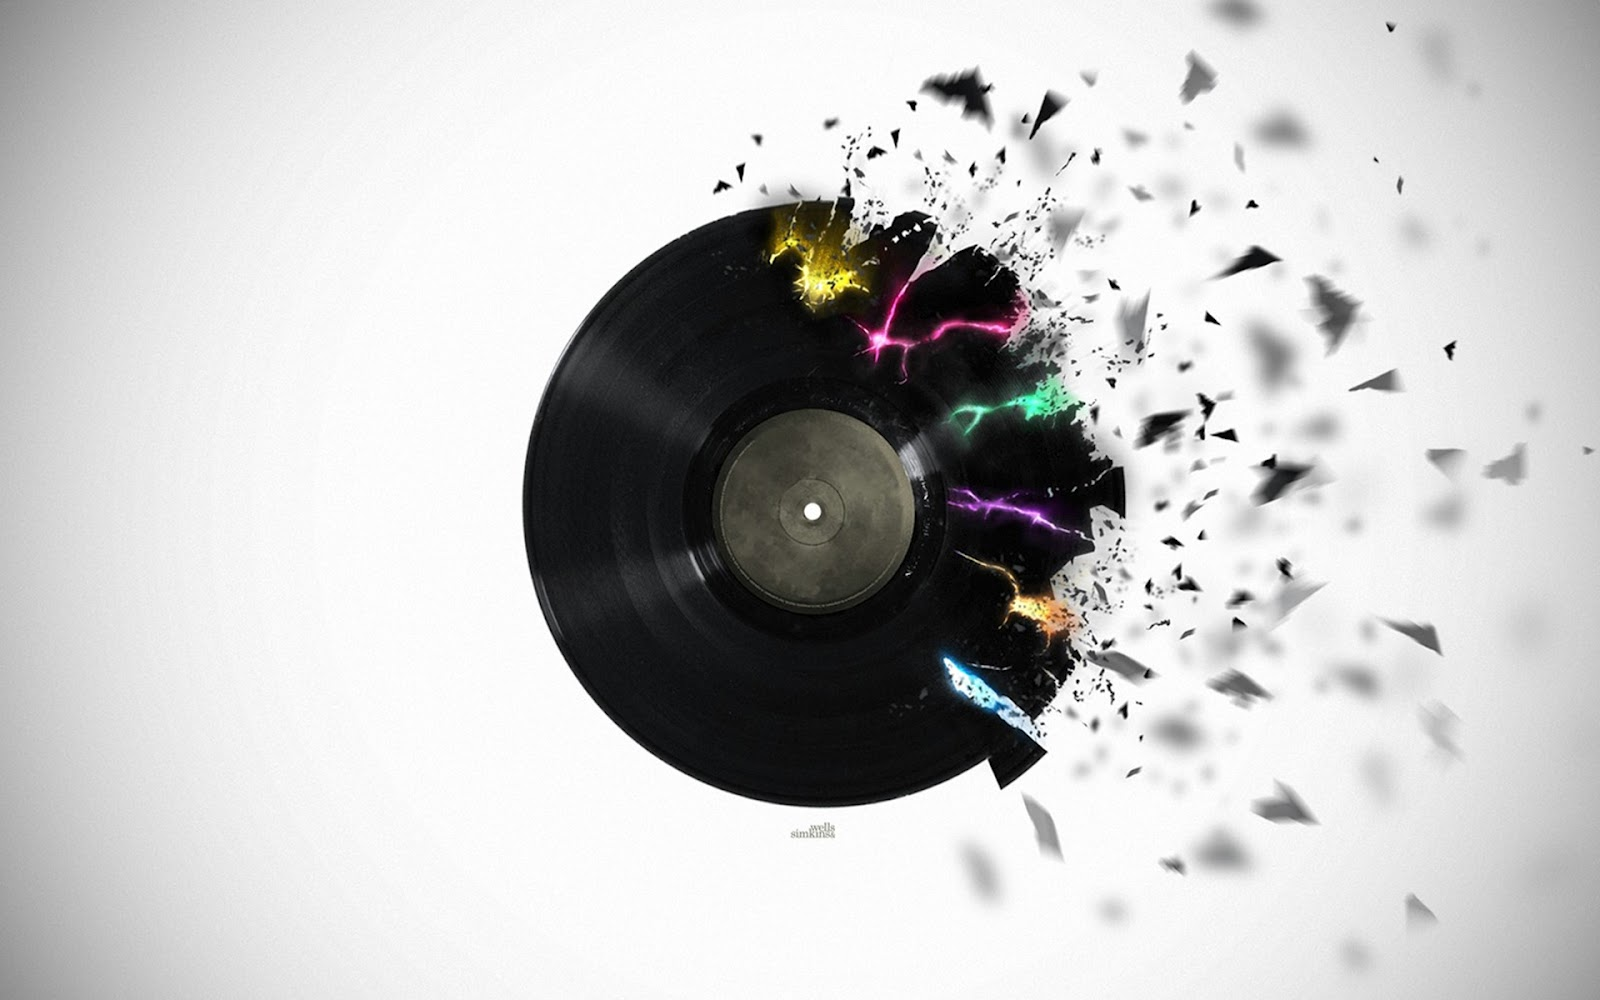 http://2.bp.blogspot.com/-C_7zcO92ejg/T8sxb8gPC0I/AAAAAAAAEtc/dszMfc-ZMEI/s1600/creative_DJ_music_CD_wallpaper.jpg